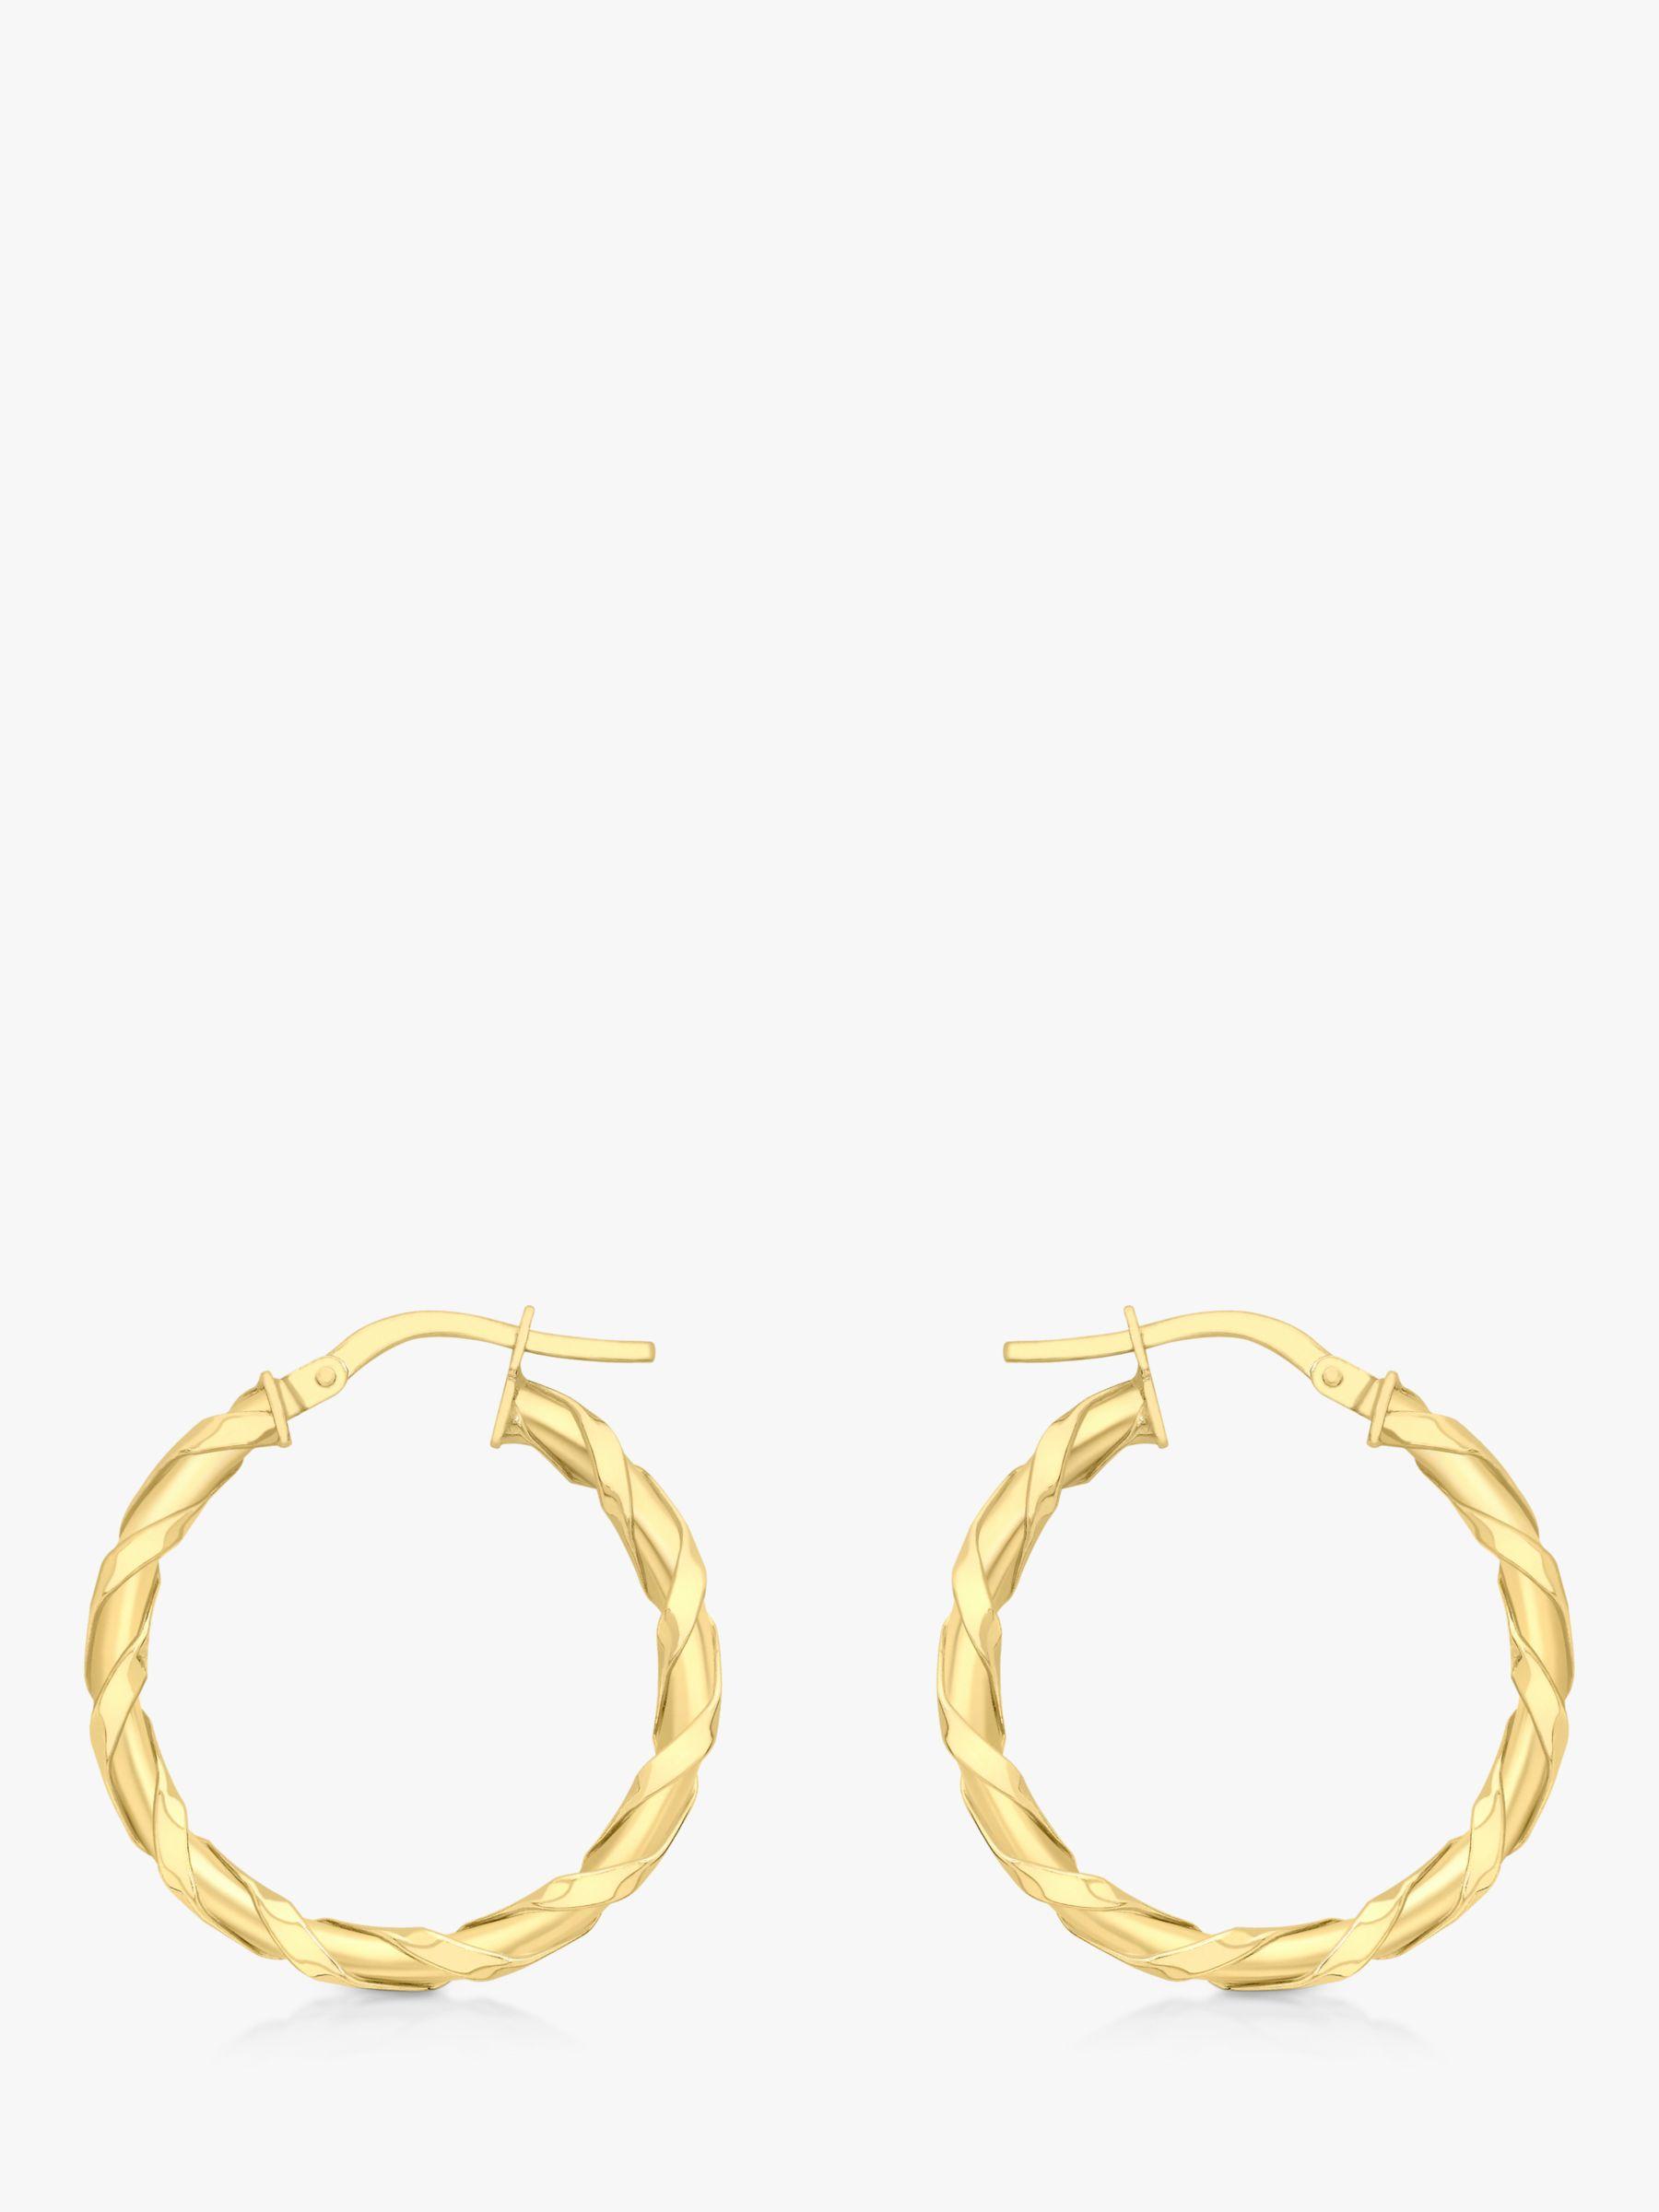 IBB IBB 9ct Gold Twist Creole Earrings, Gold